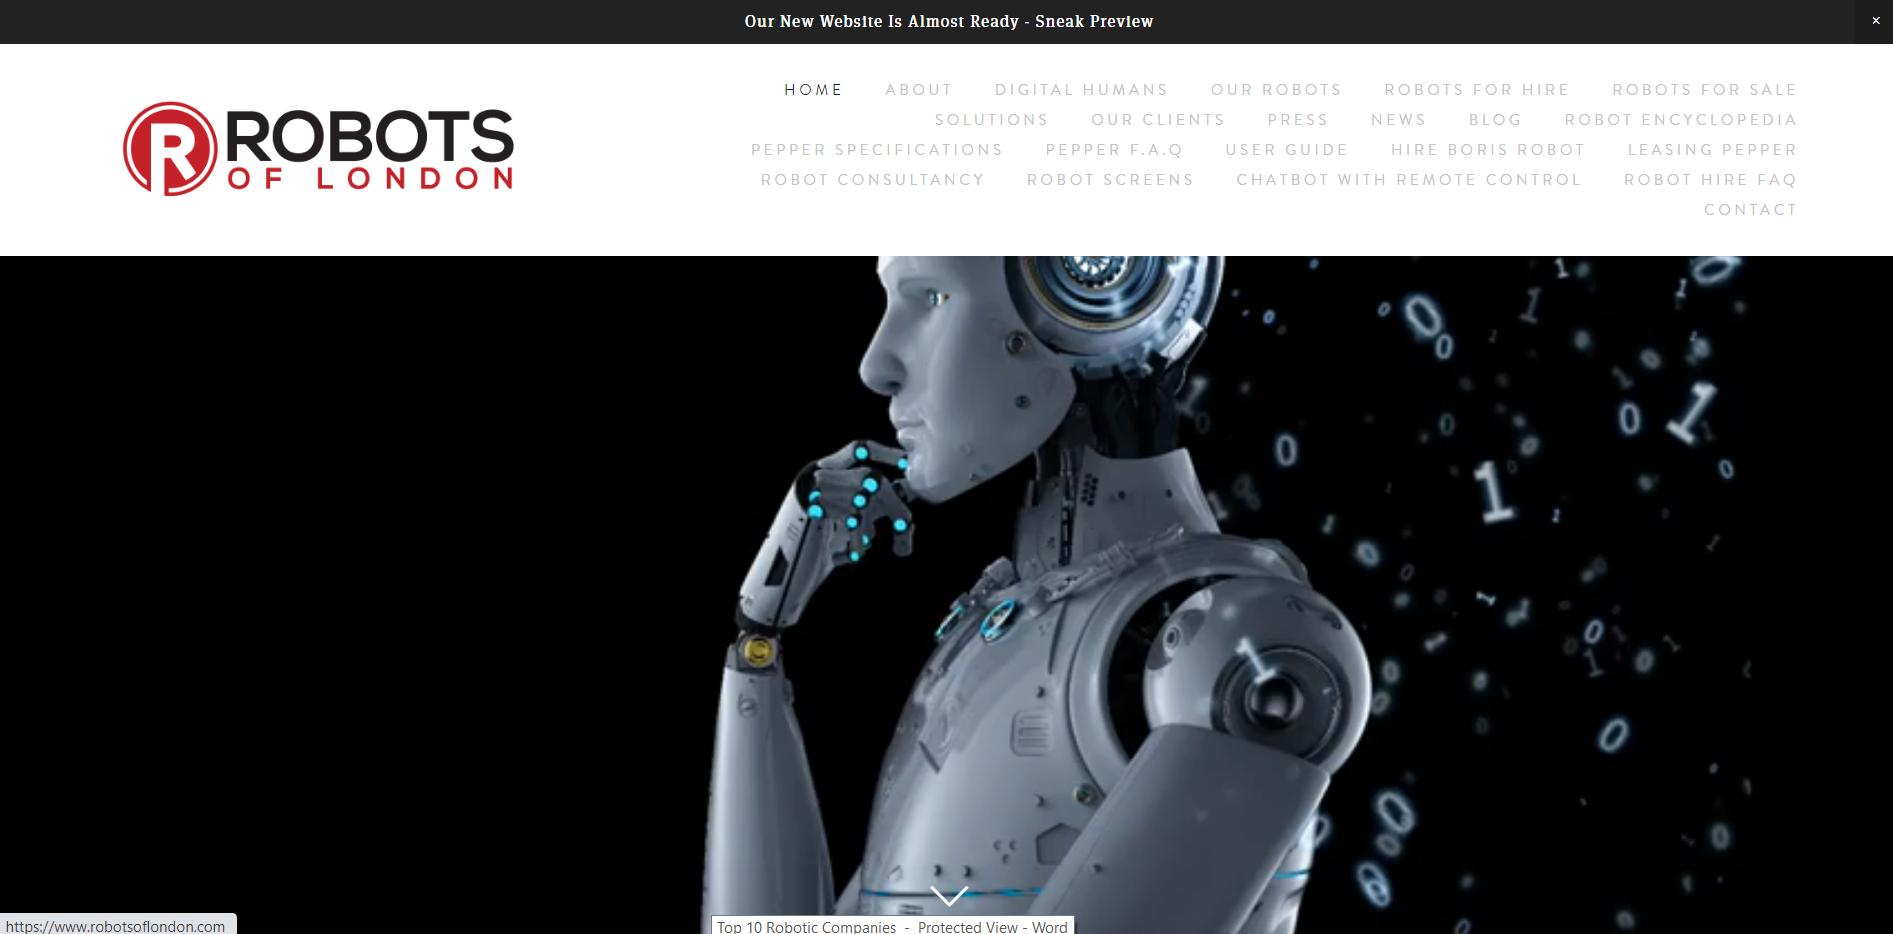 Robots of London